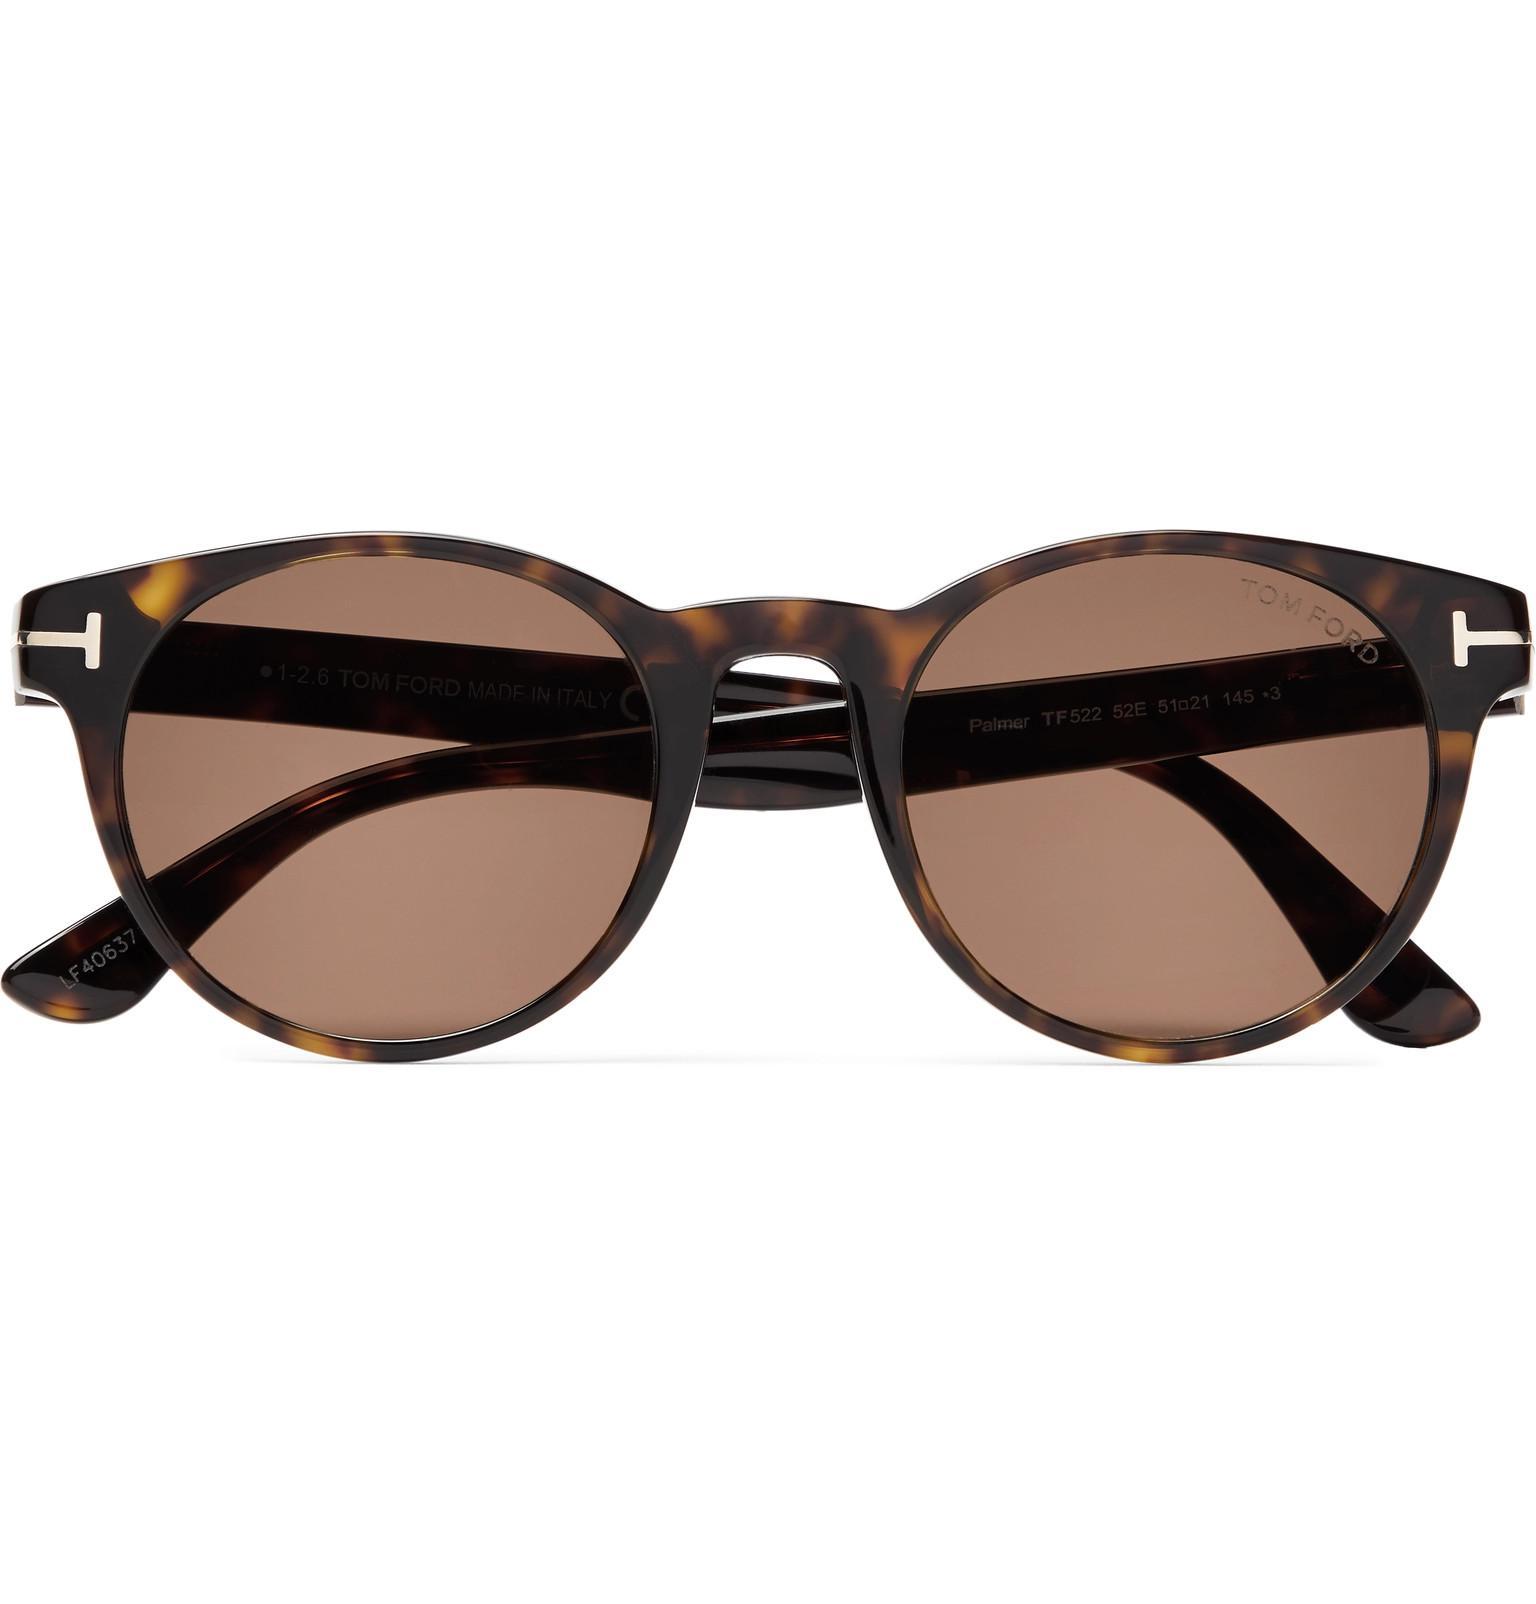 f977ba35872e8 Tom Ford. Men s Brown Palmer Round-frame Tortoiseshell Acetate Sunglasses